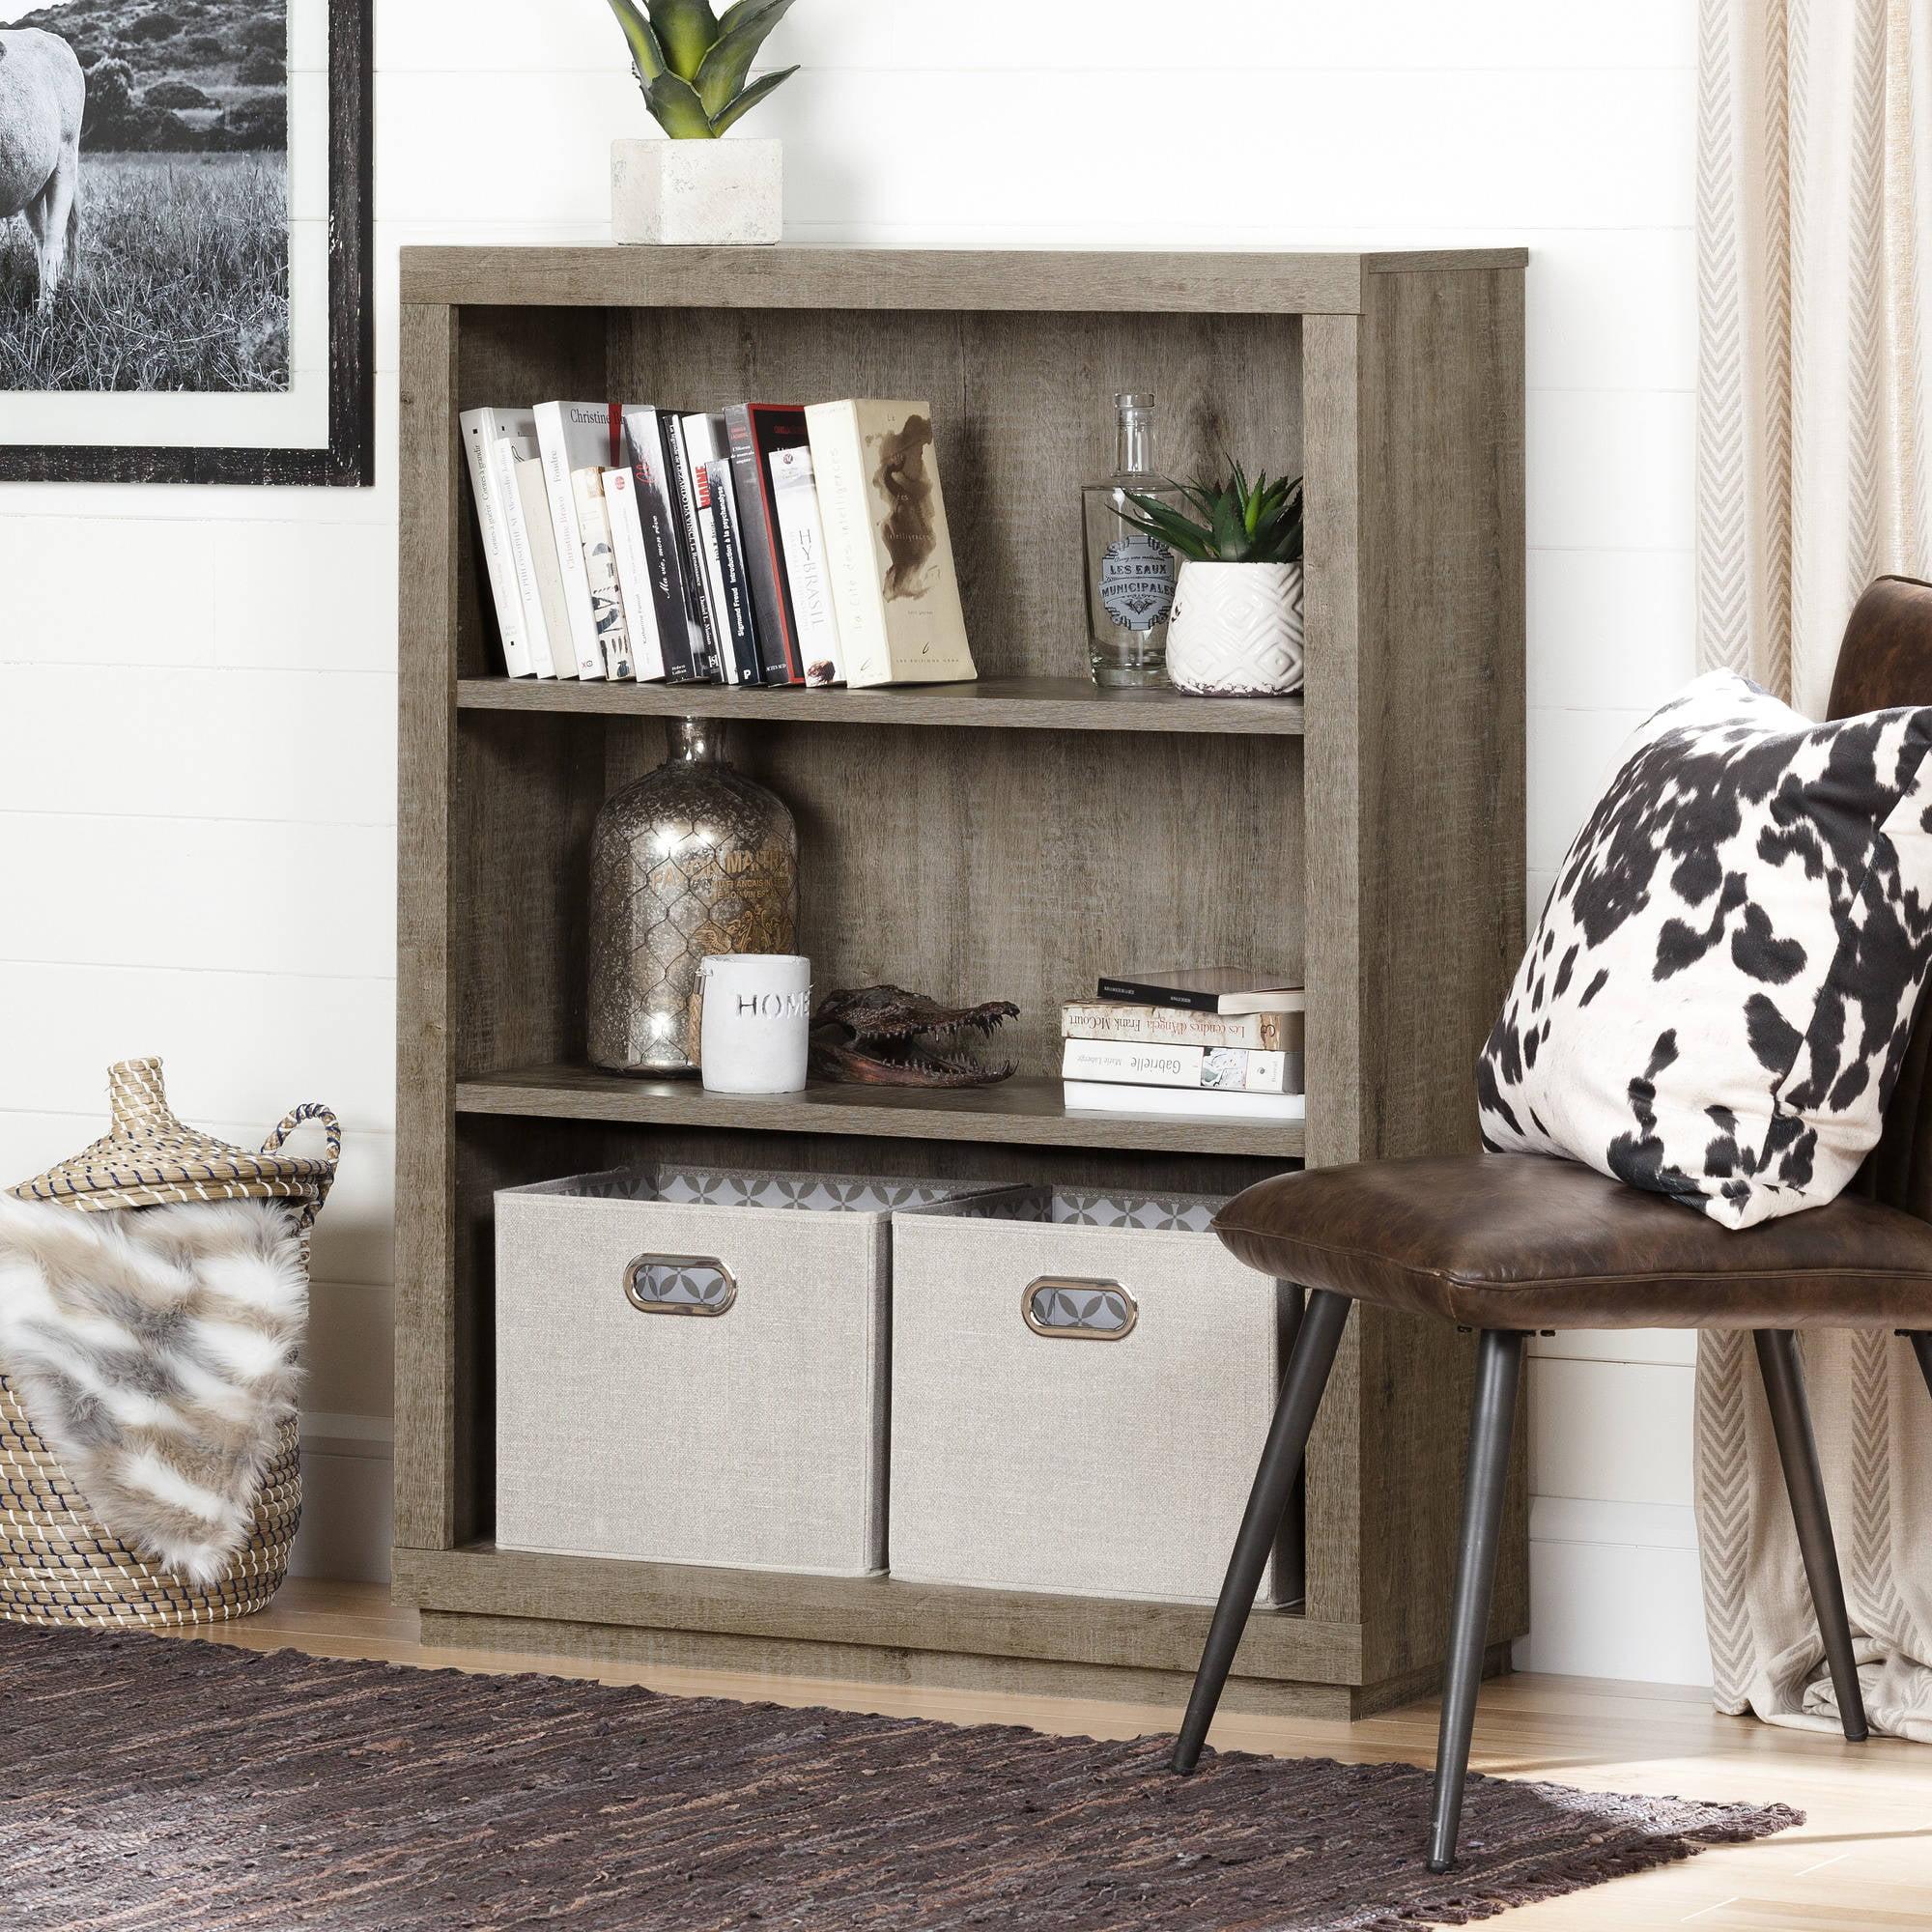 "South Shore Kanji 3-Shelf 46 1/4"" Bookcase, Weathered Oak"